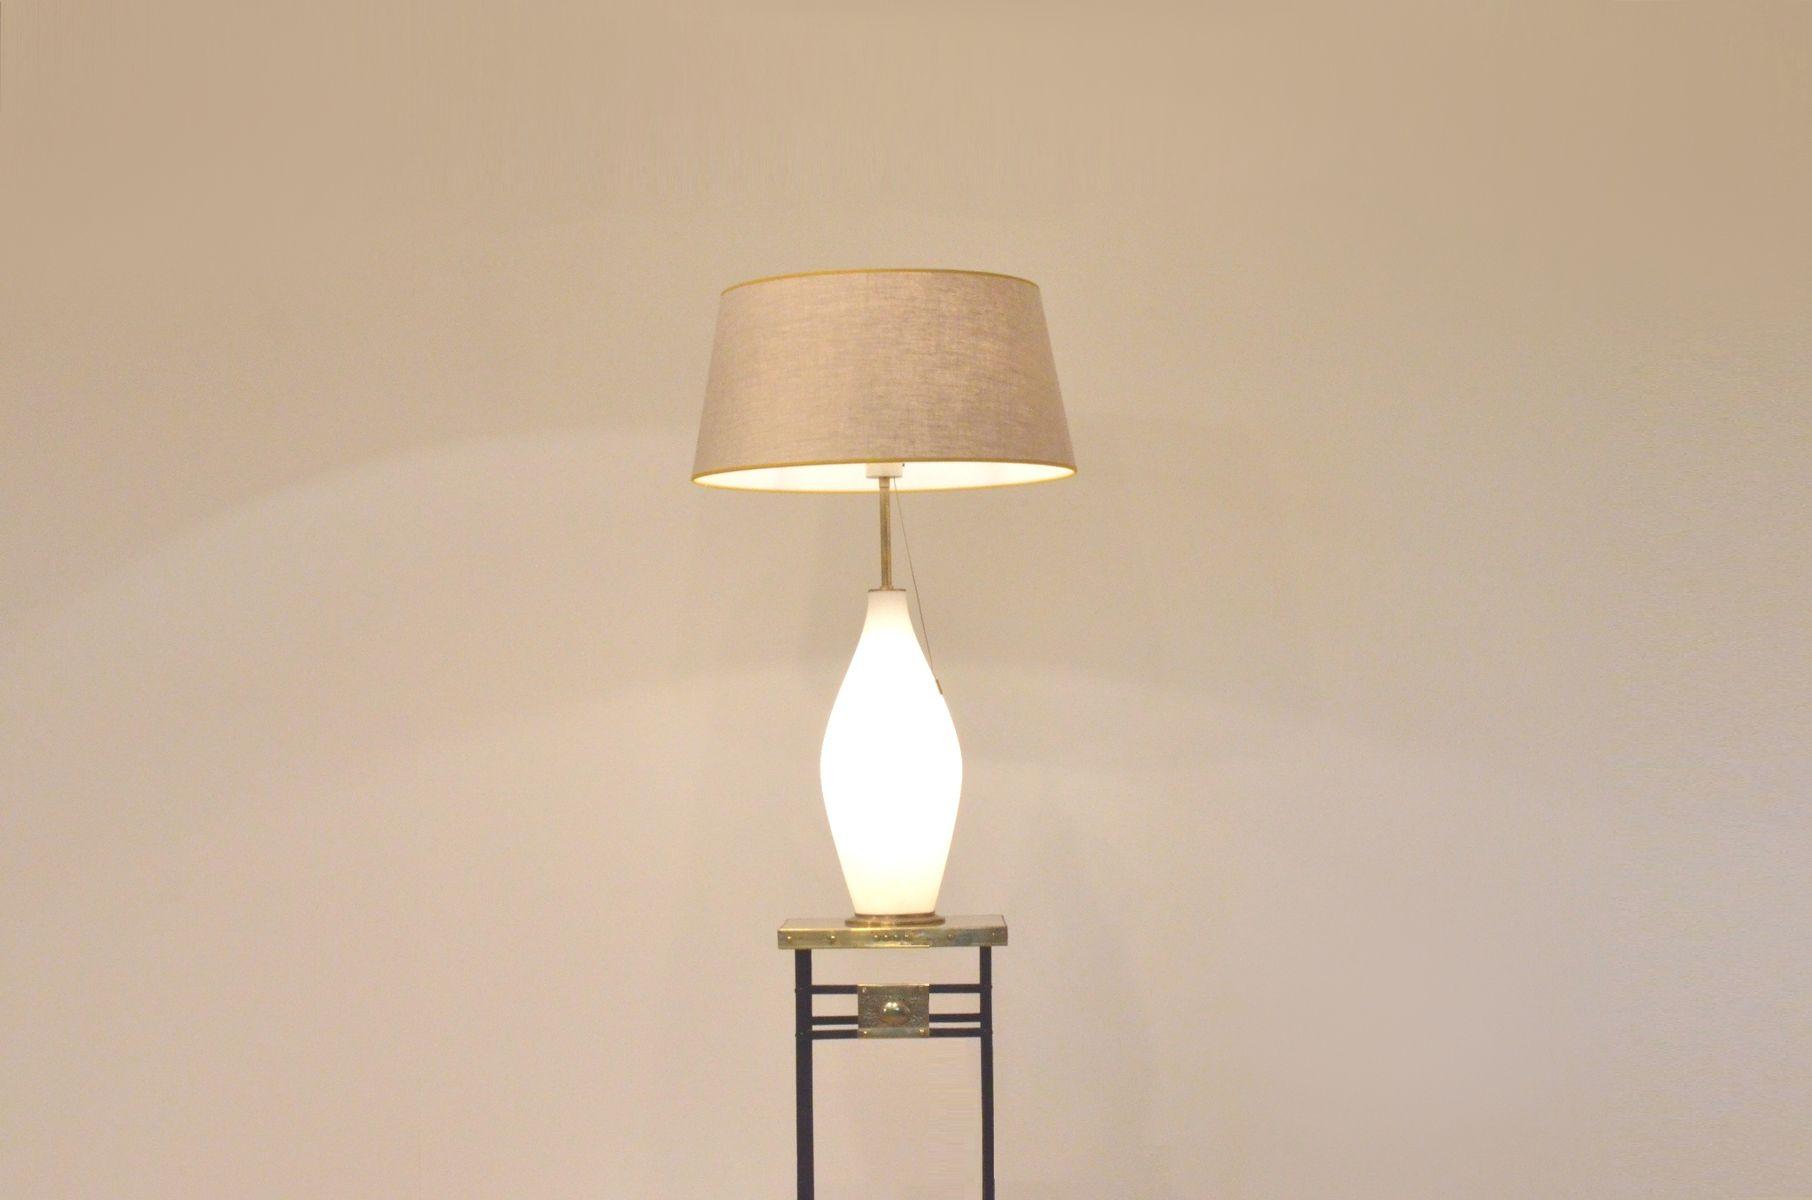 grande lampe de bureau vintage en laiton et en verre opalin de peill putzler en vente sur pamono. Black Bedroom Furniture Sets. Home Design Ideas